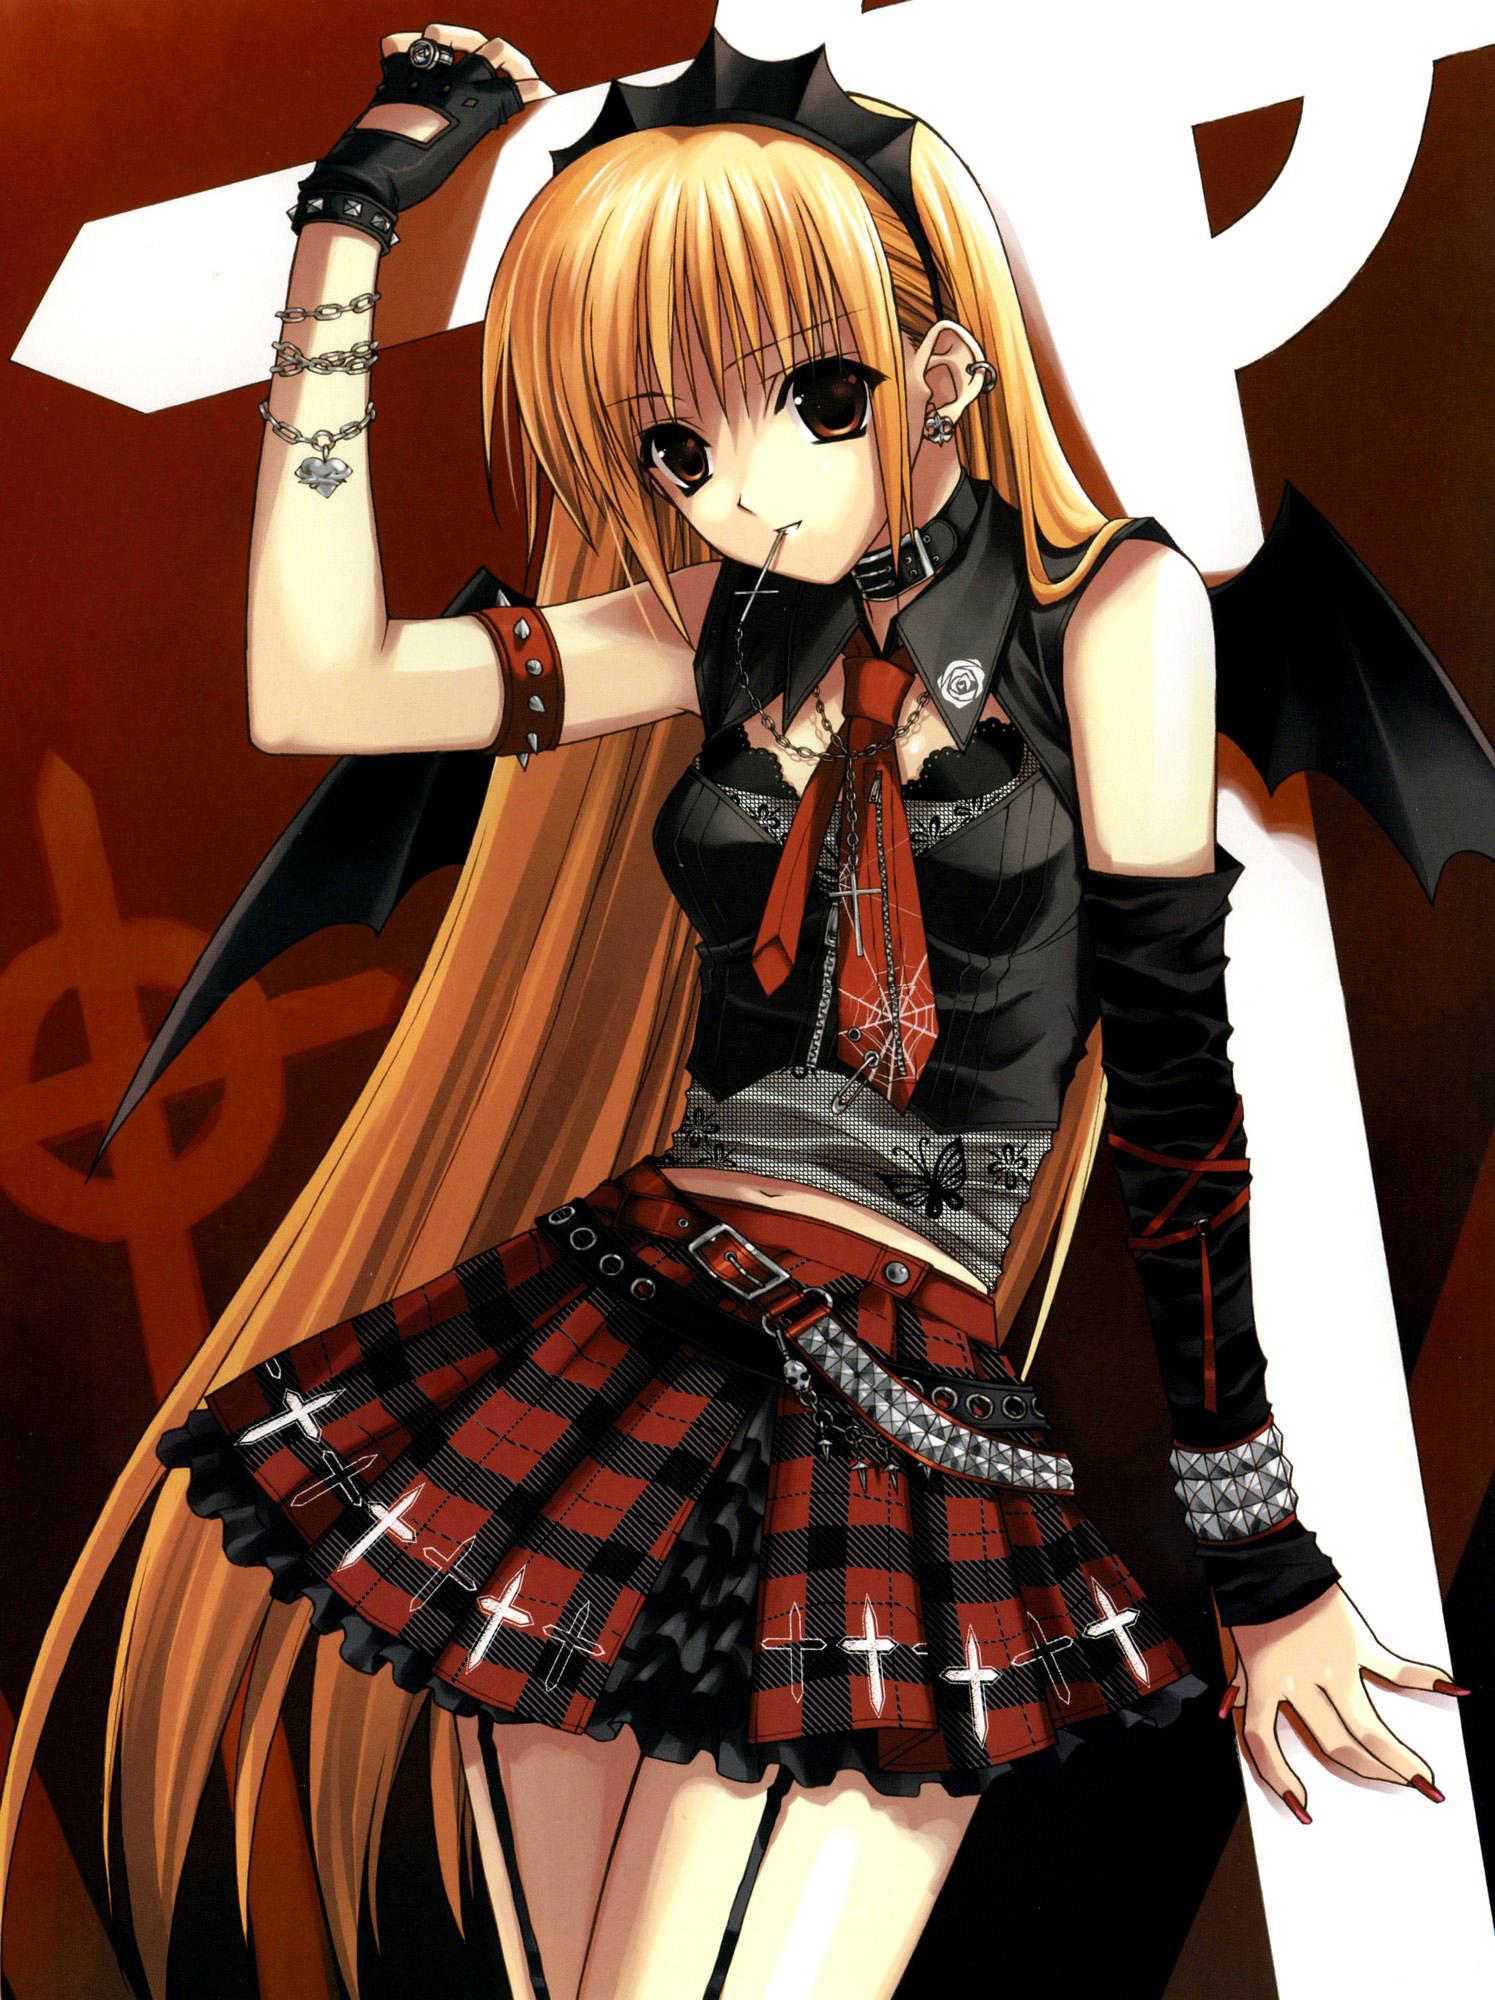 a15f47c06 Gothic devil girl illustration